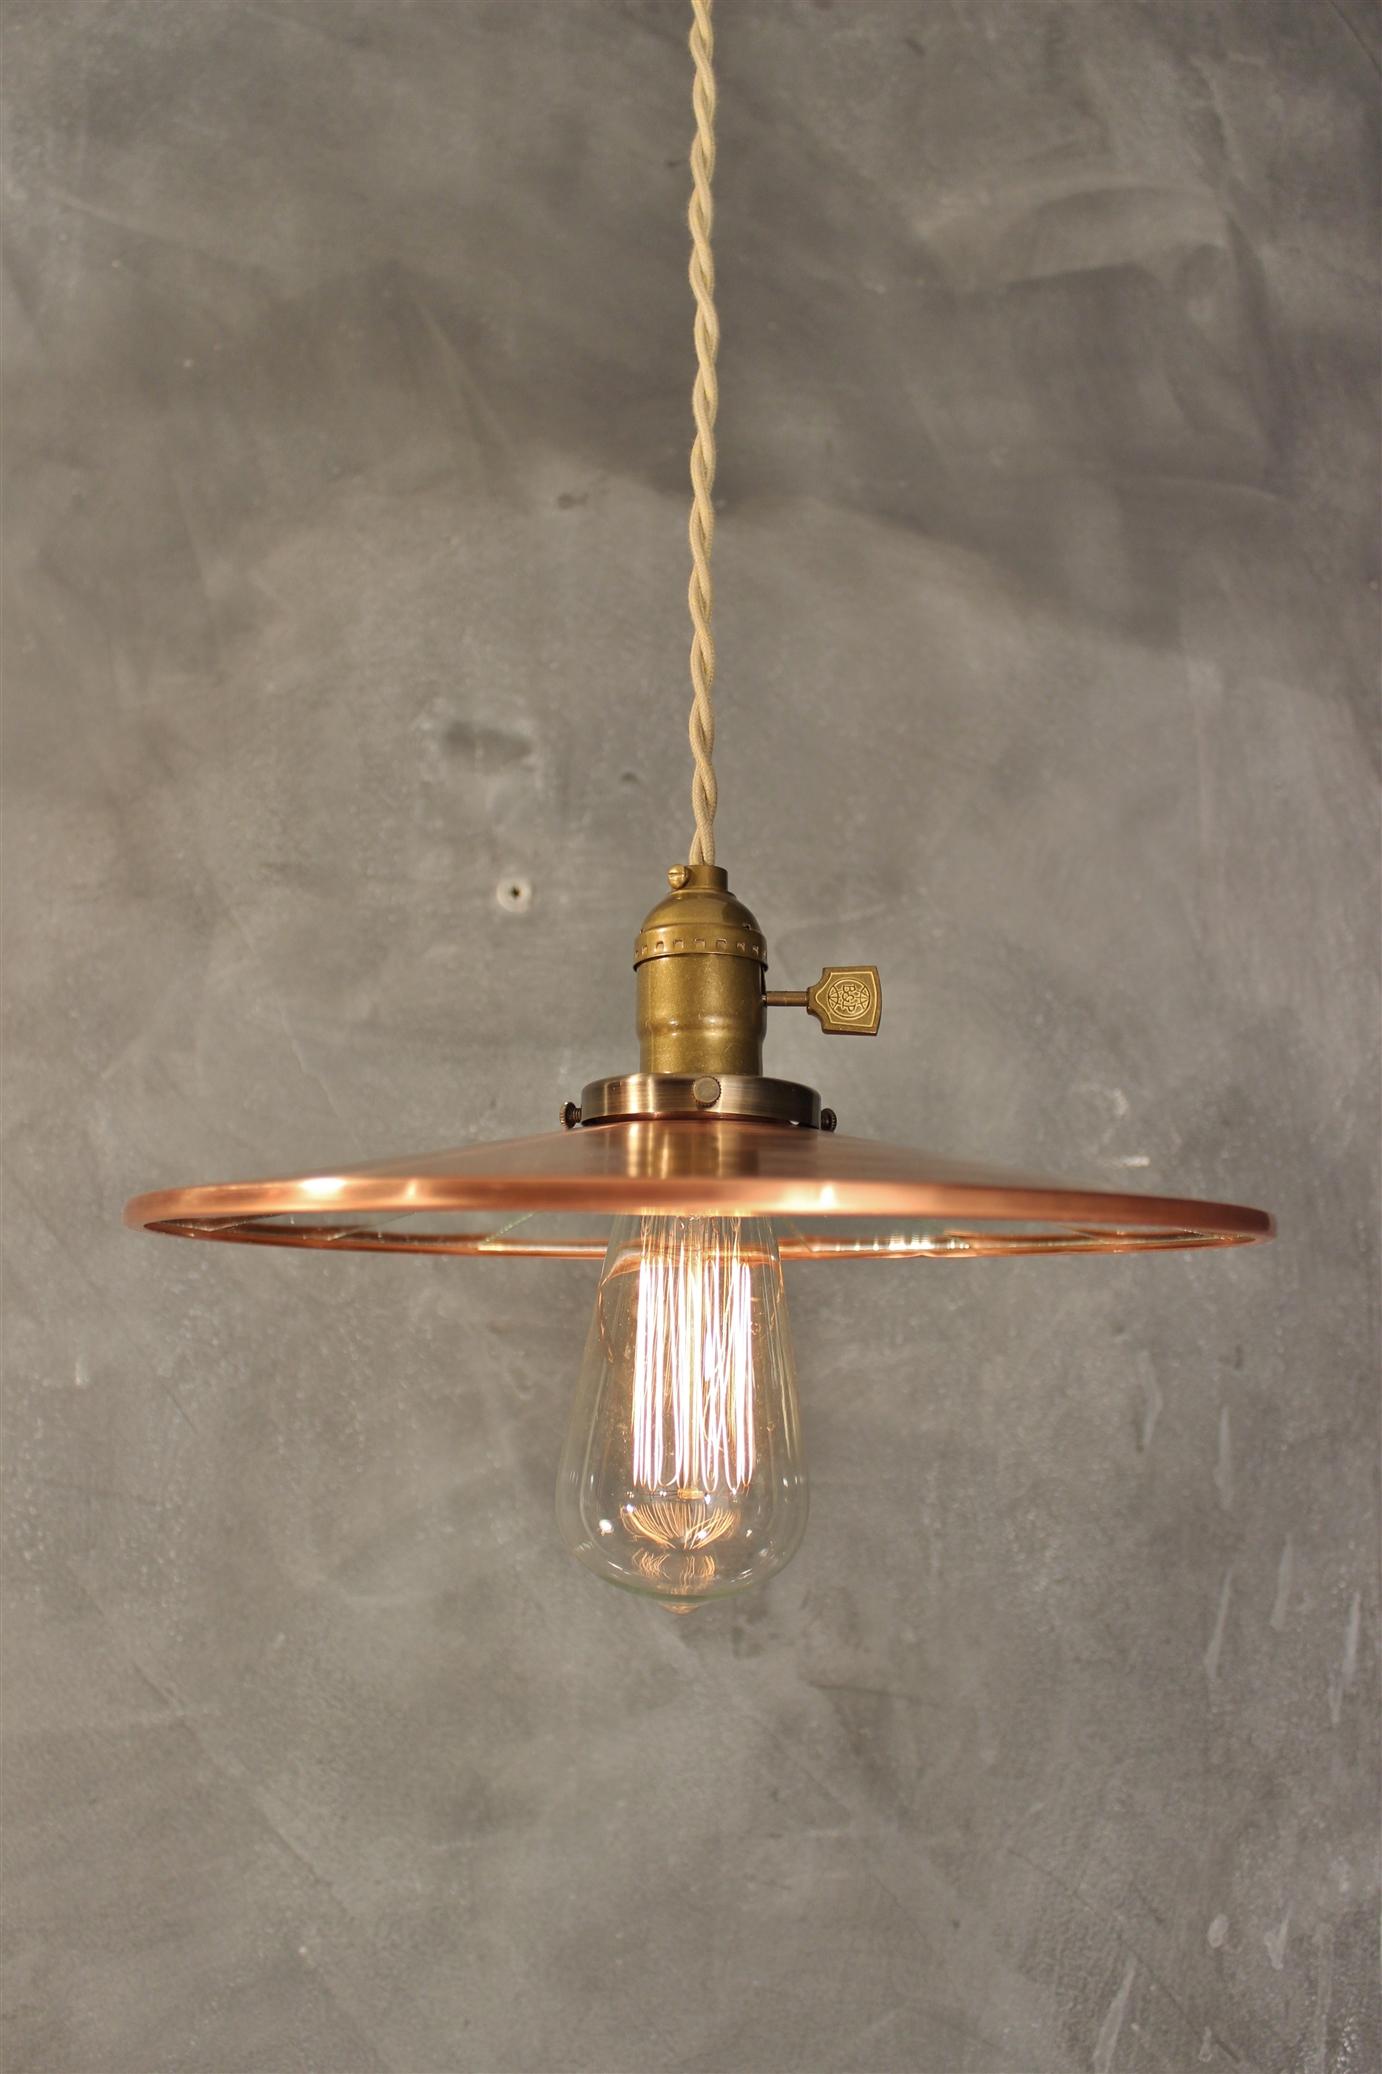 Industrial Pendant Lamp w/ Flat Mirror Reflector Shade ...